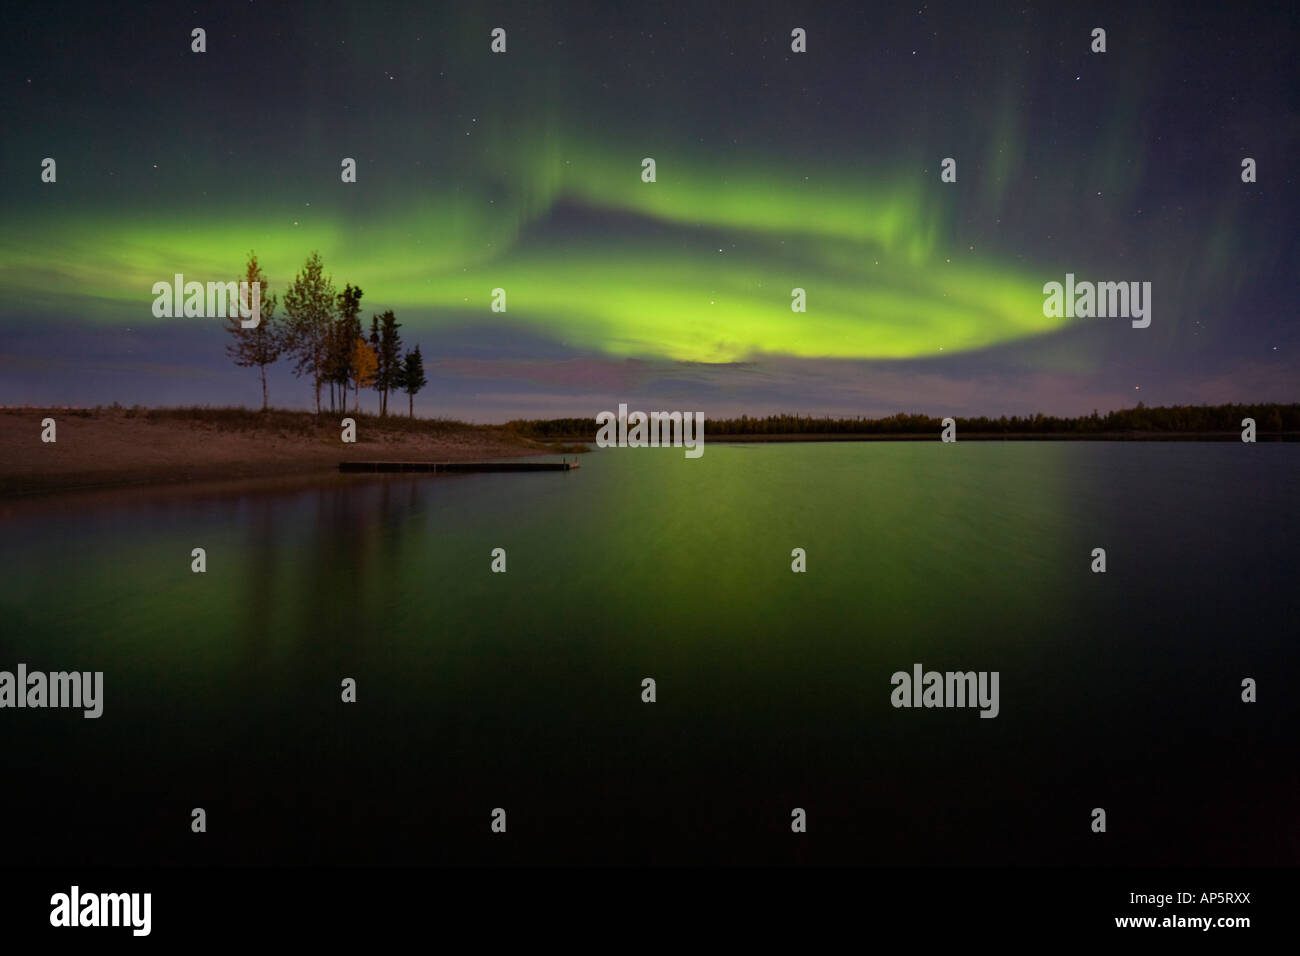 Clean image of a stunning Aurora Borealis display over still lake and trees near Fairbanks, Alaska - Stock Image